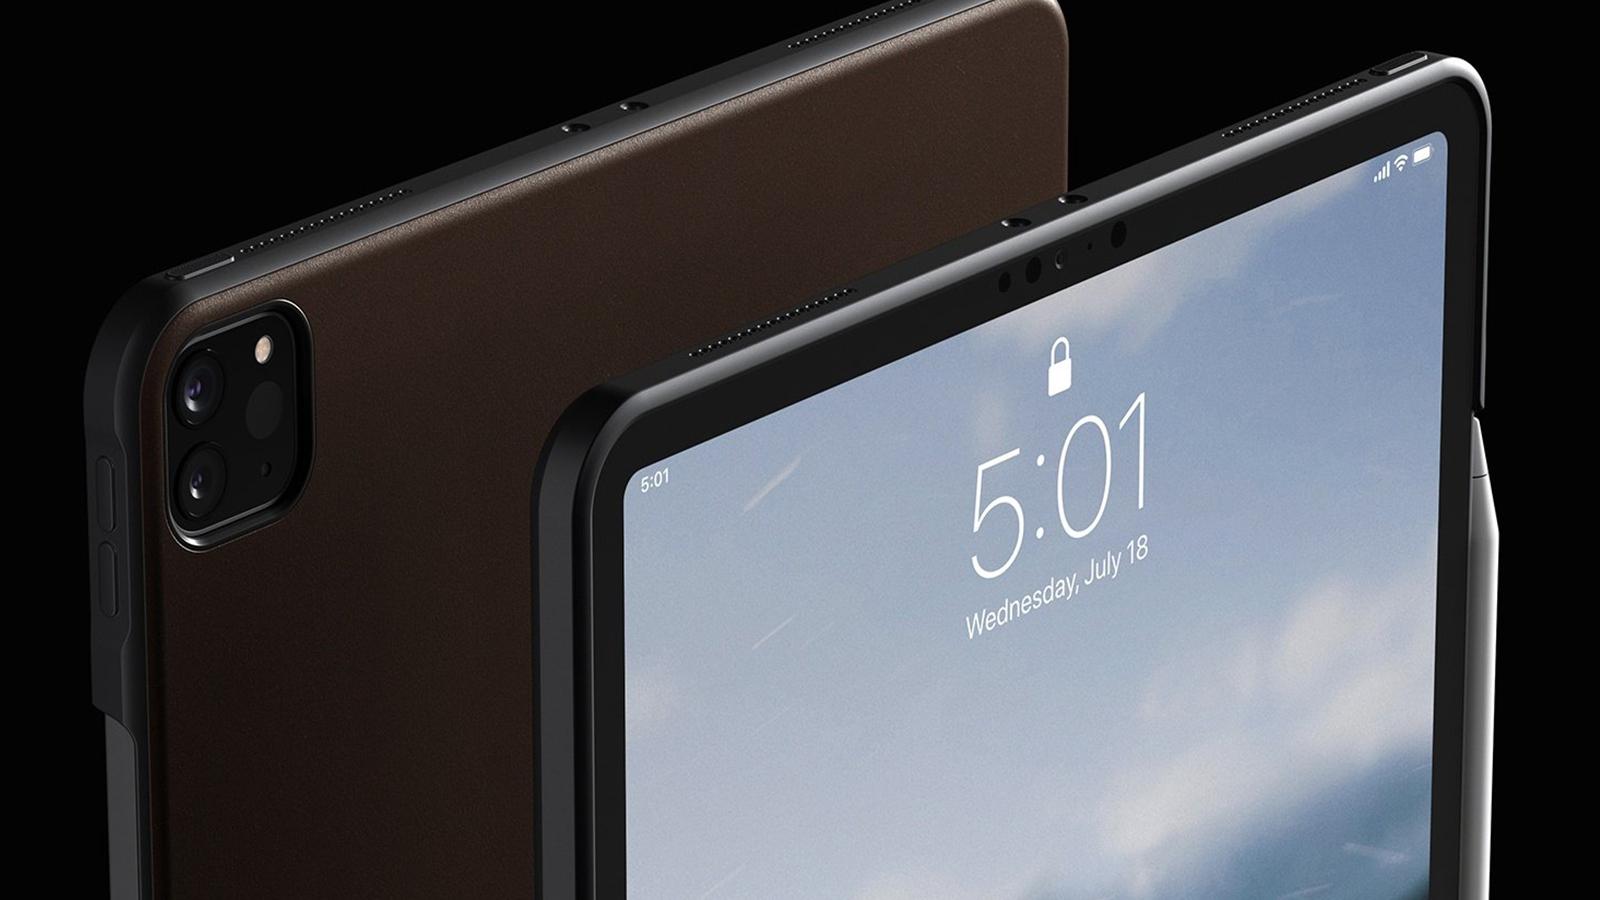 Nomad Horween Leather iPad Pro Cases & Folios